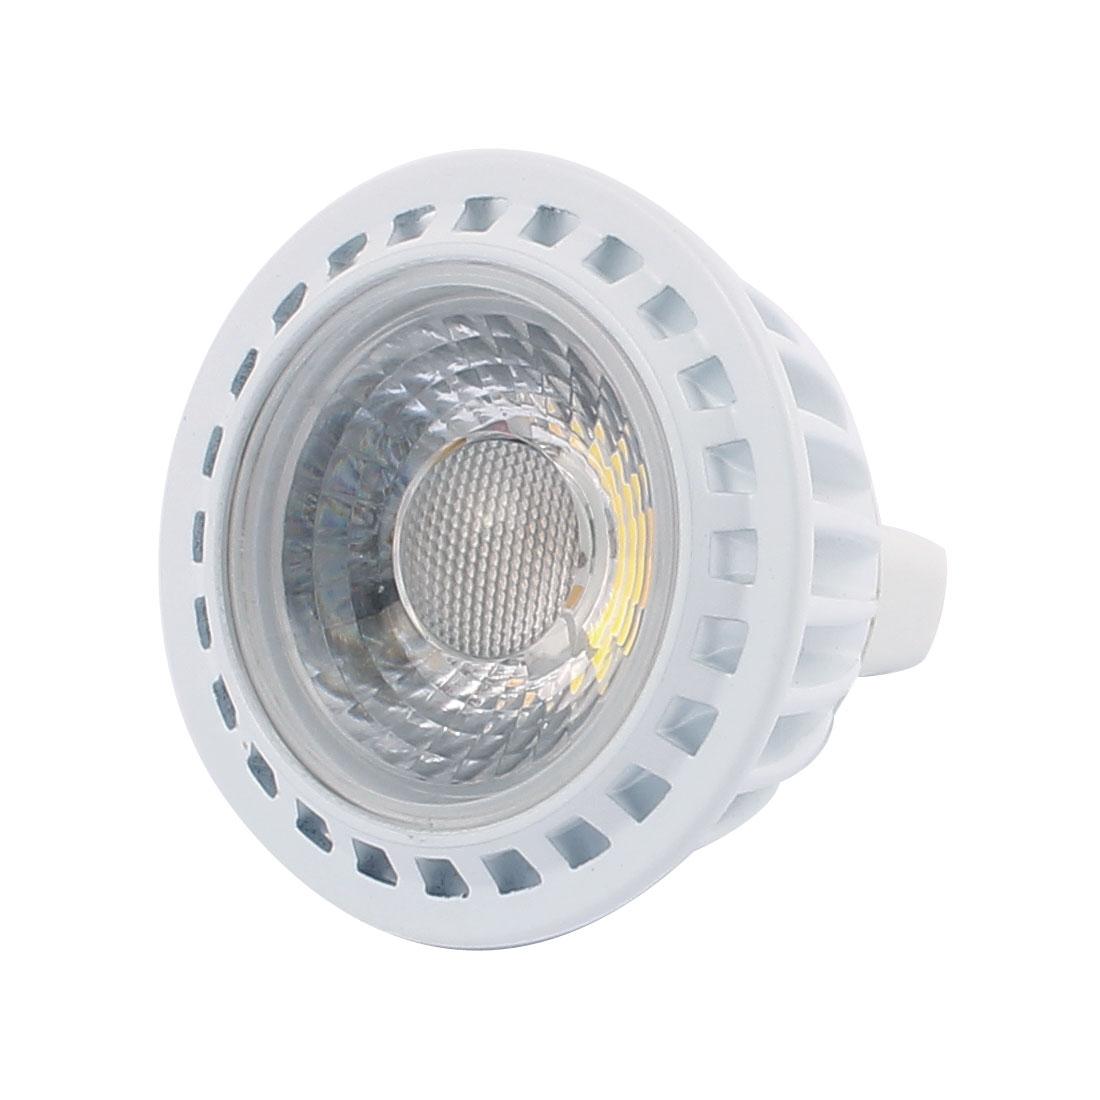 DC12V 3W MR16 COB Integrated Chip LED Spotlight Lamp Bulb Downlight Pure White